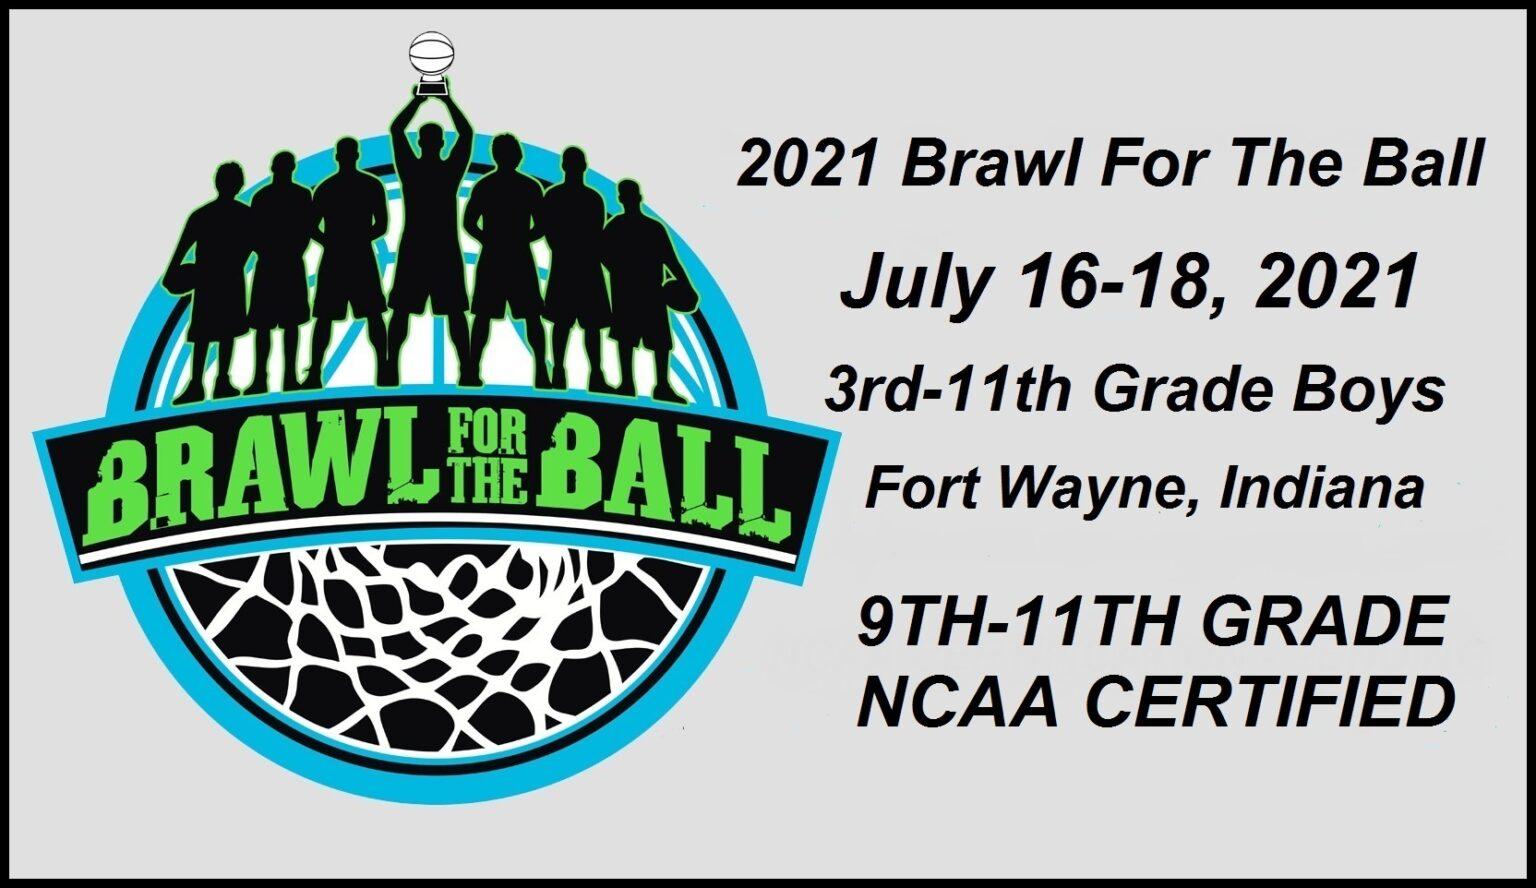 brawl_for_ball2021